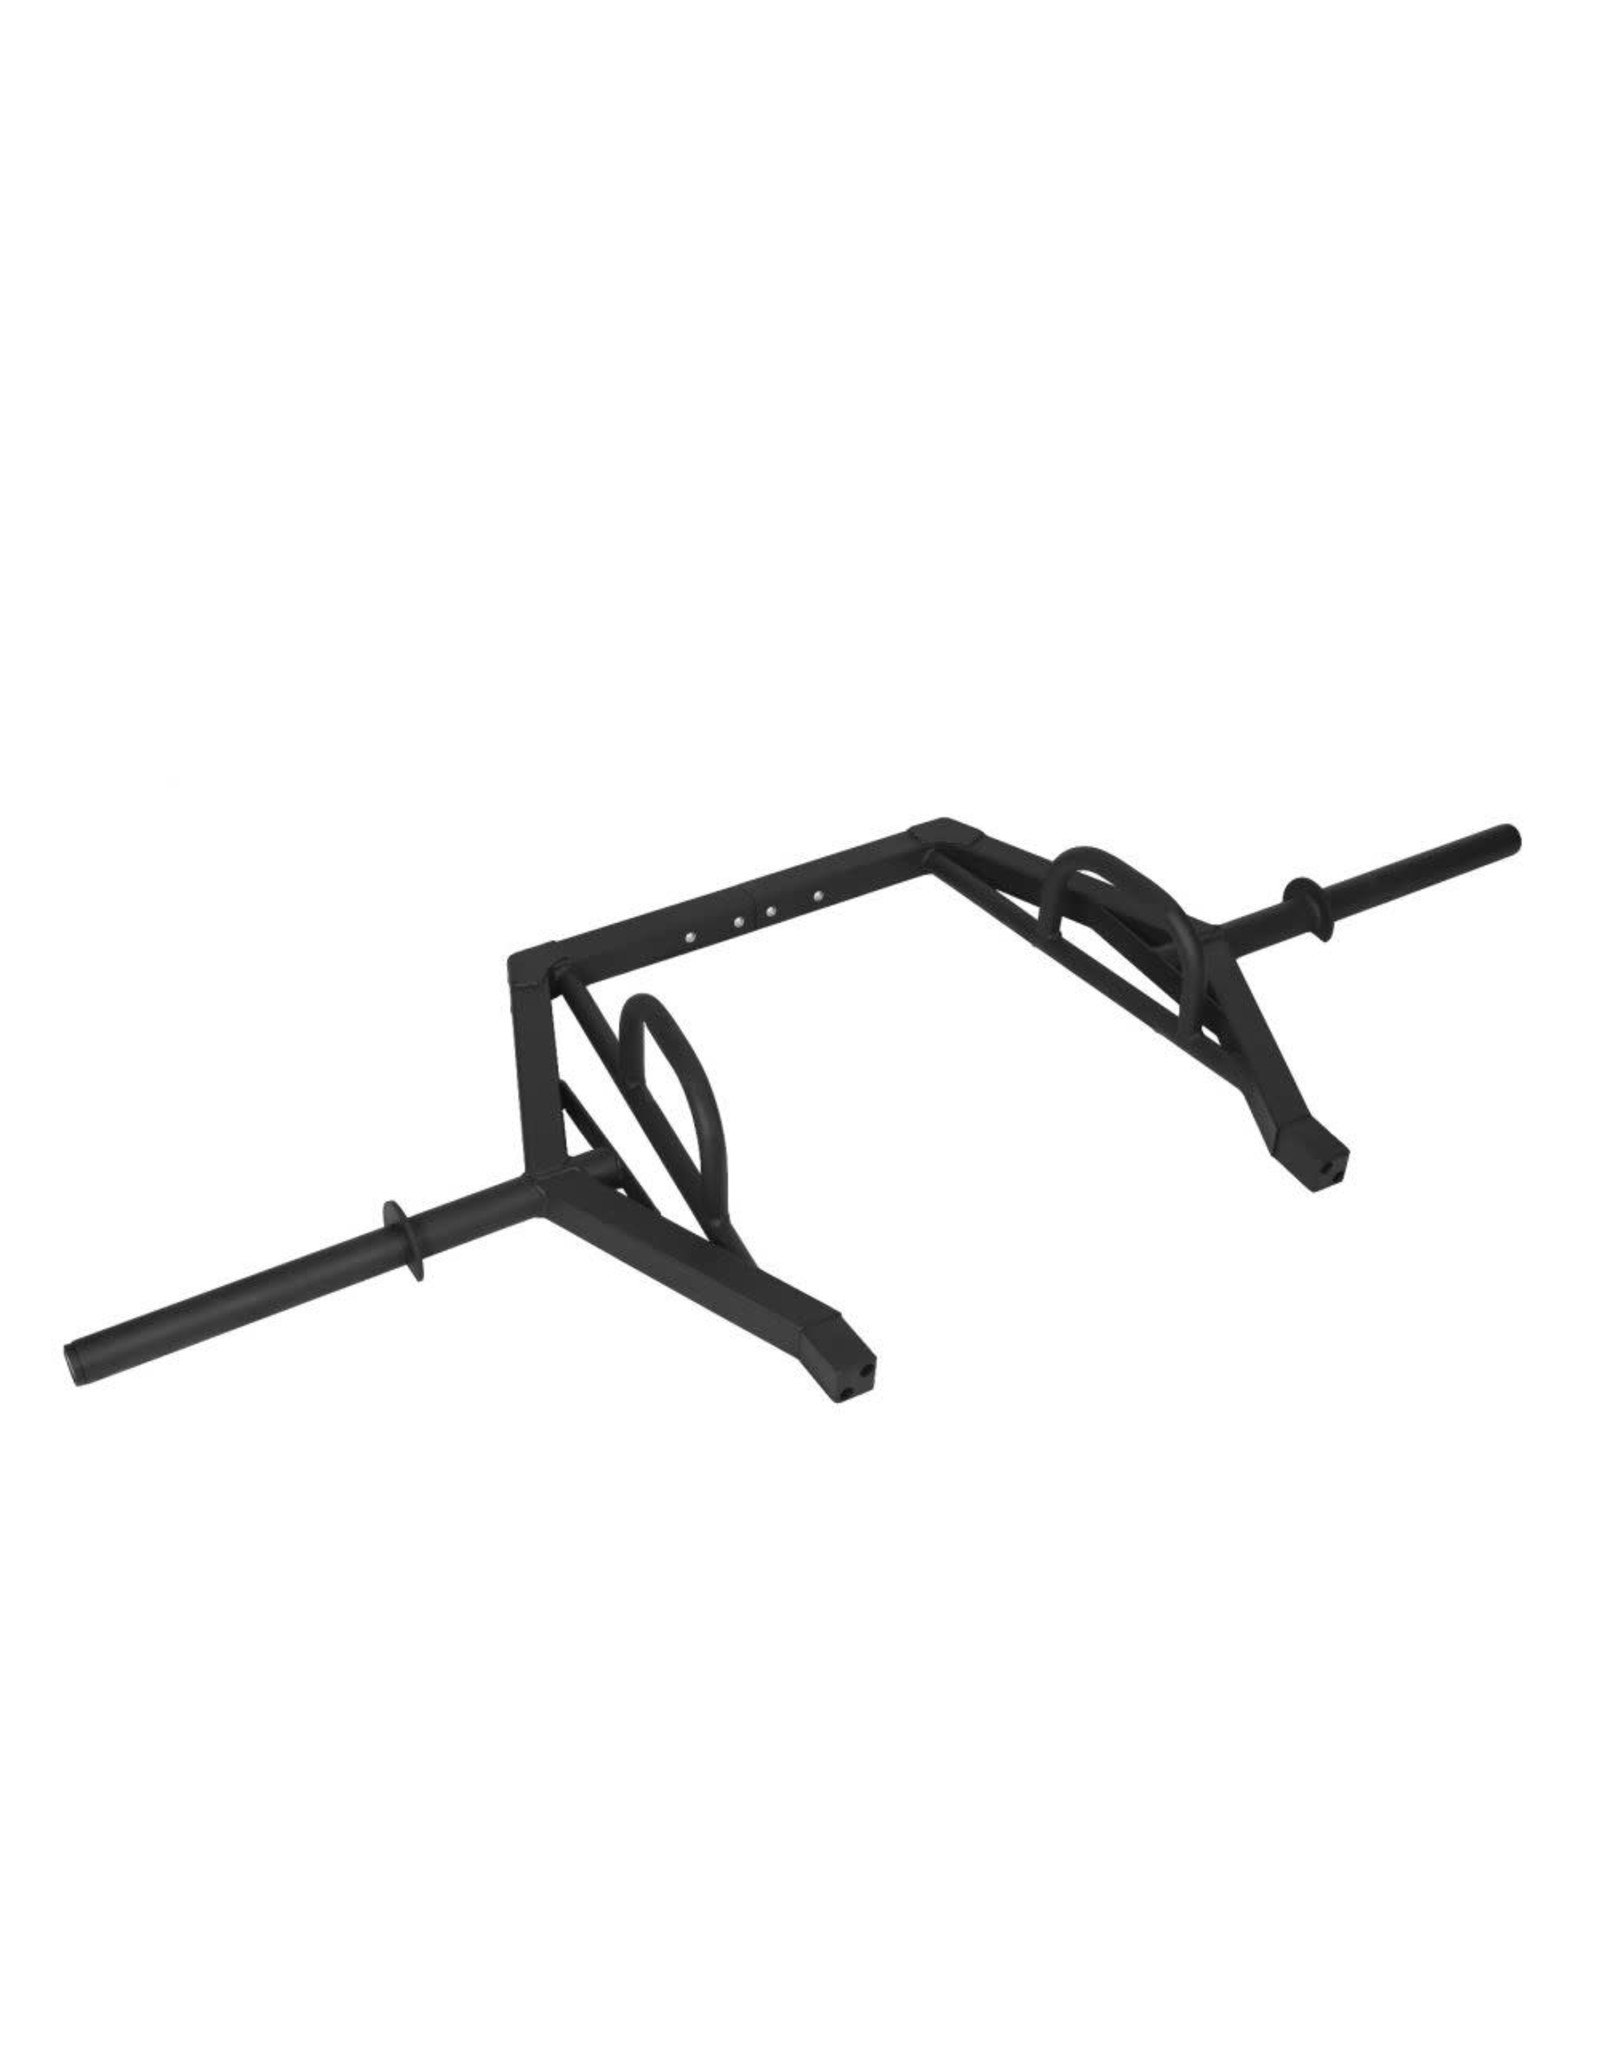 Iron Hog Iron Hog Modular Multi Functional Trap Bar